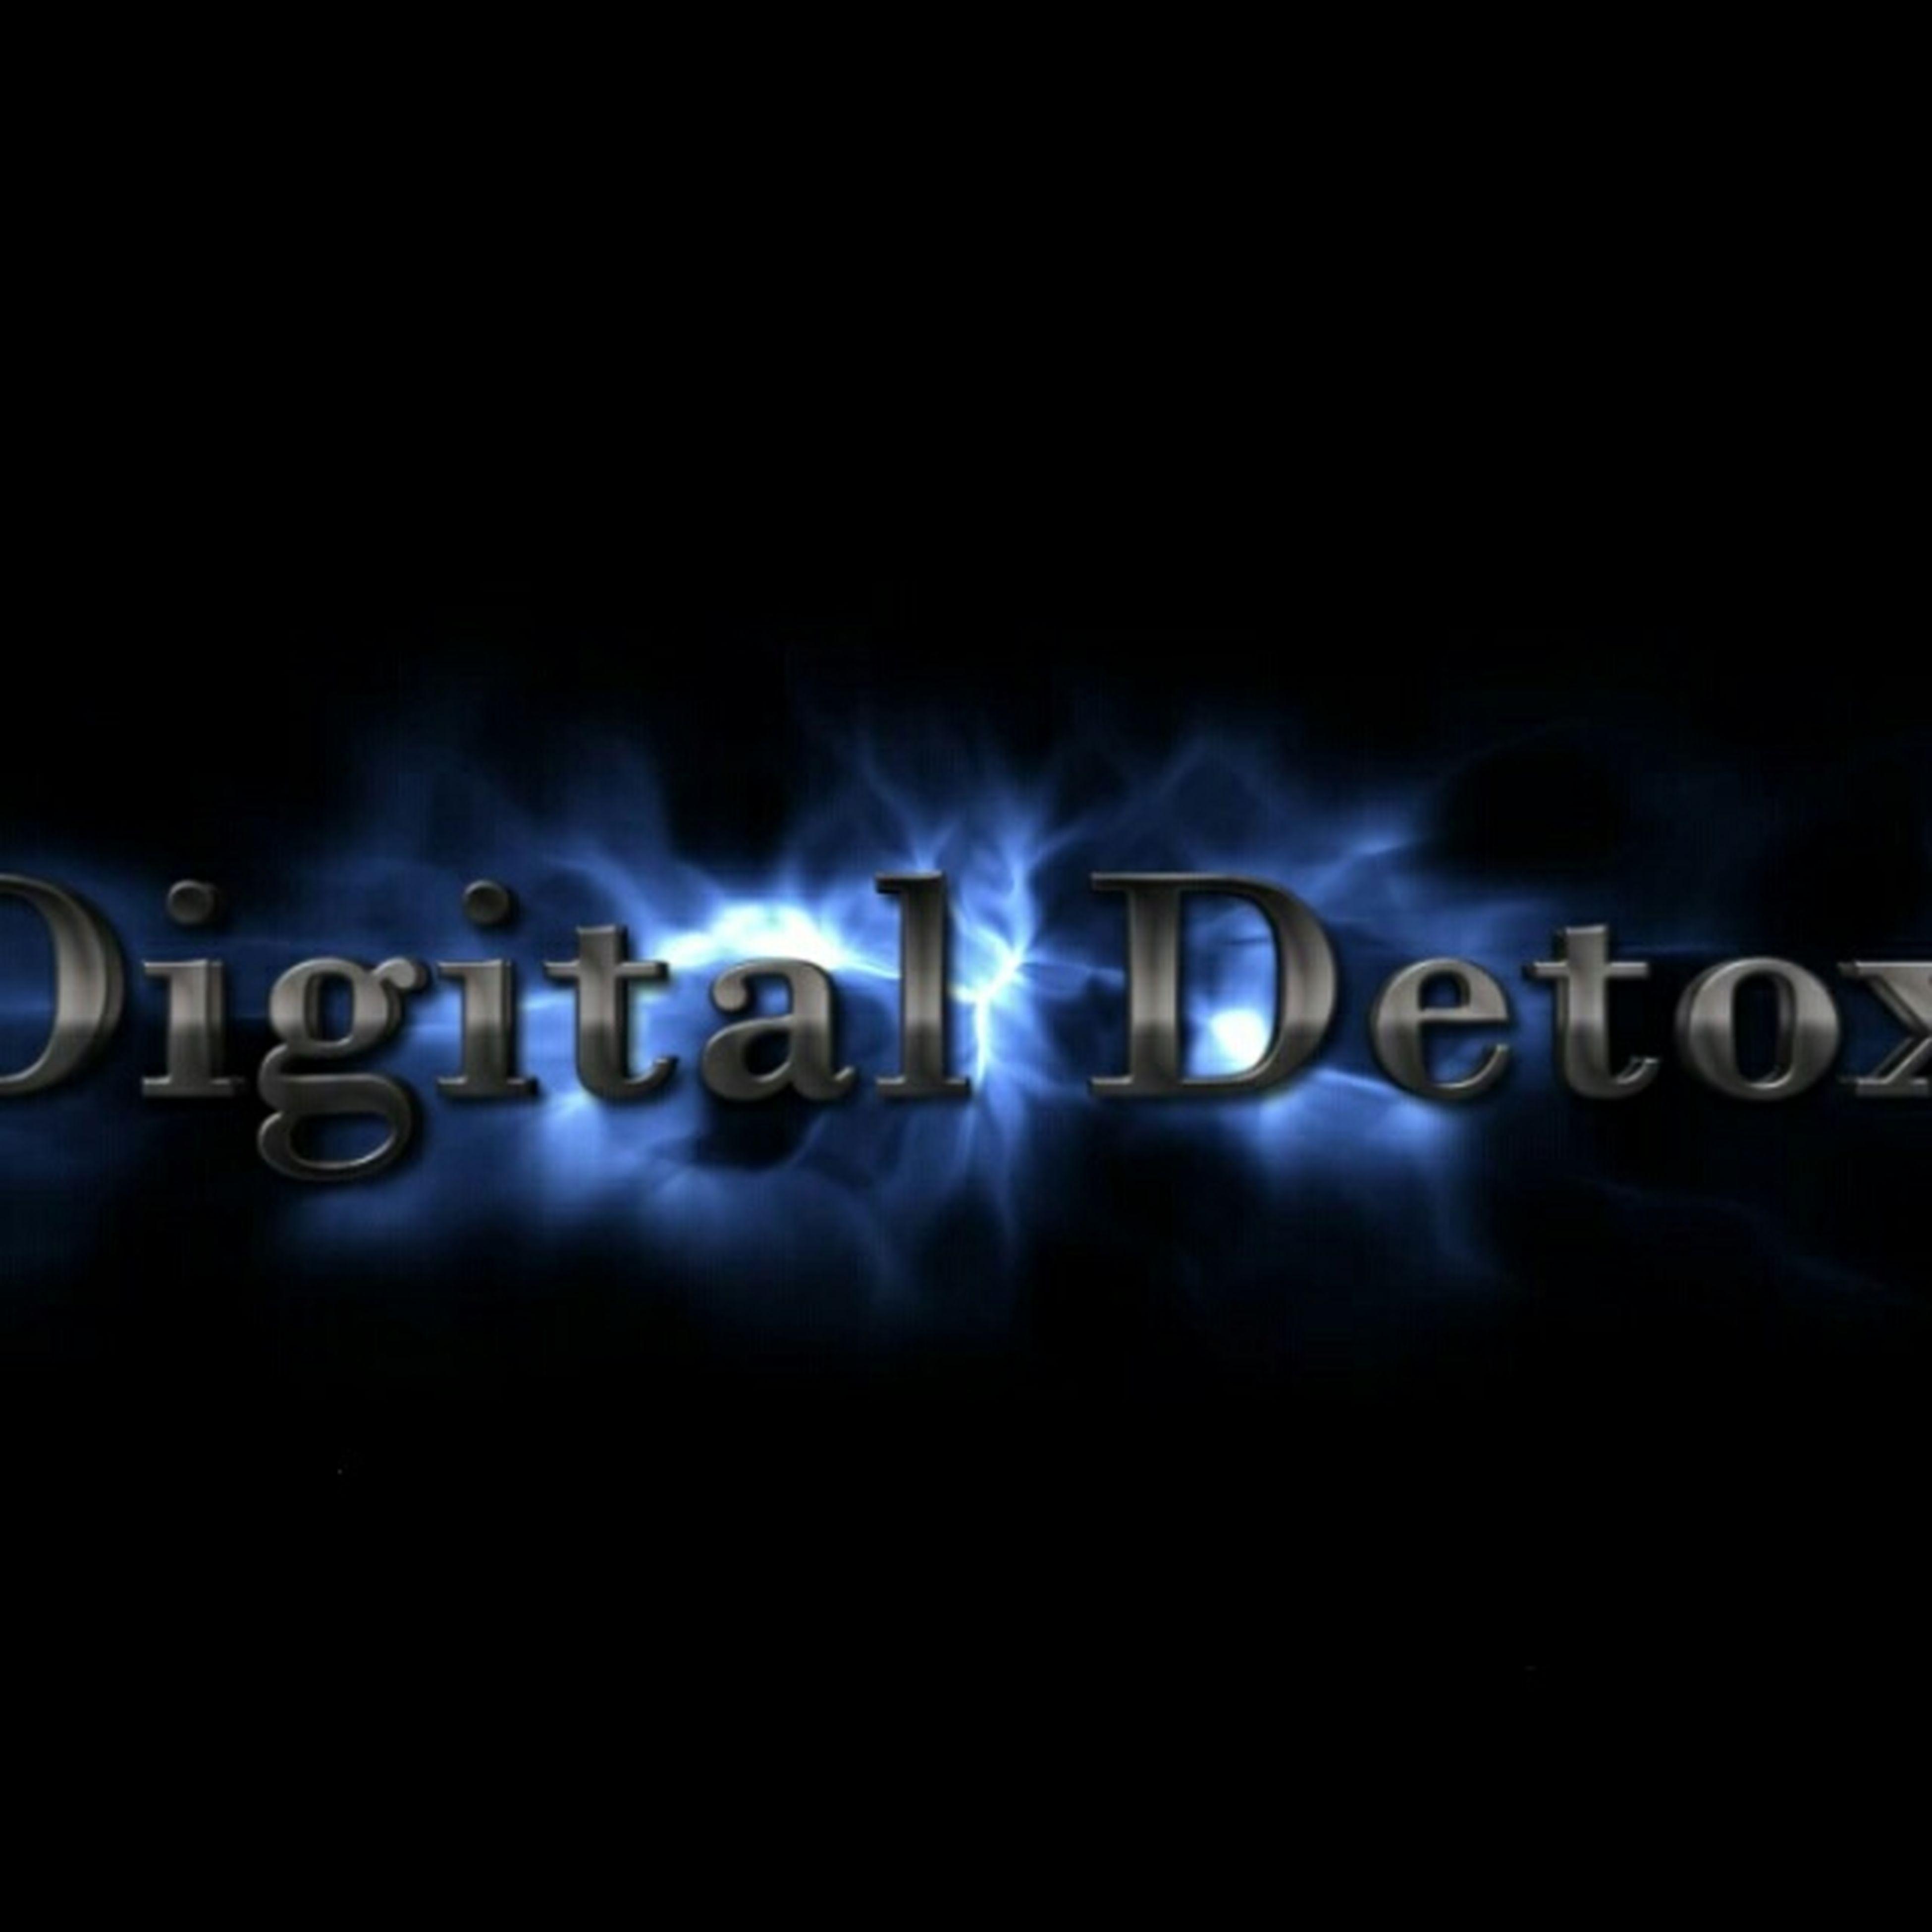 Aftereffects Adobeaftereffects Videoeffects Motionblur MotionGraphics Videofx